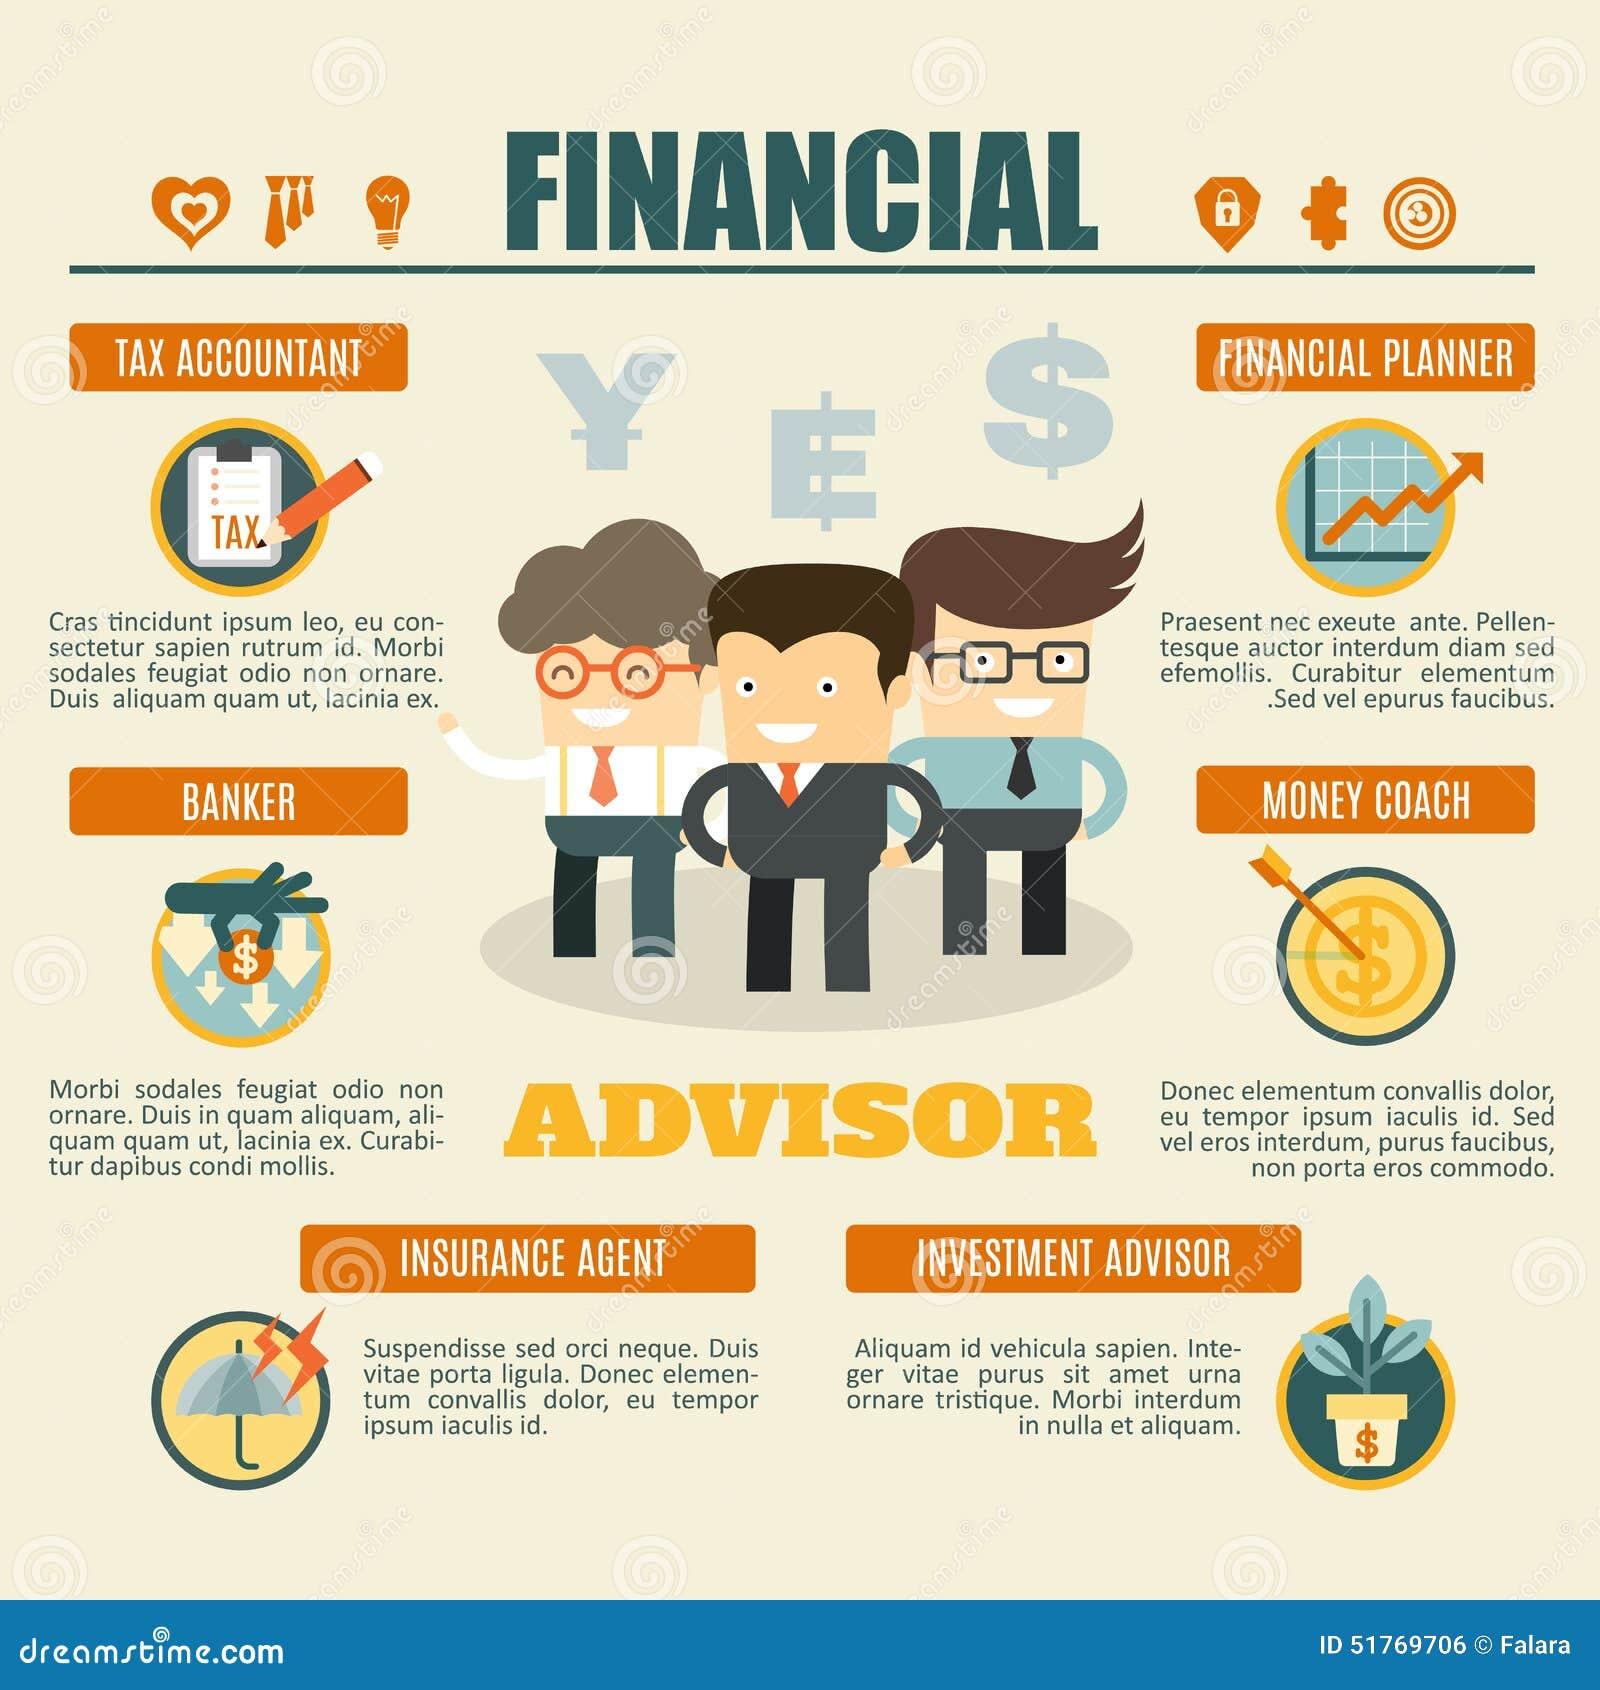 Financiële adviseursinfographics